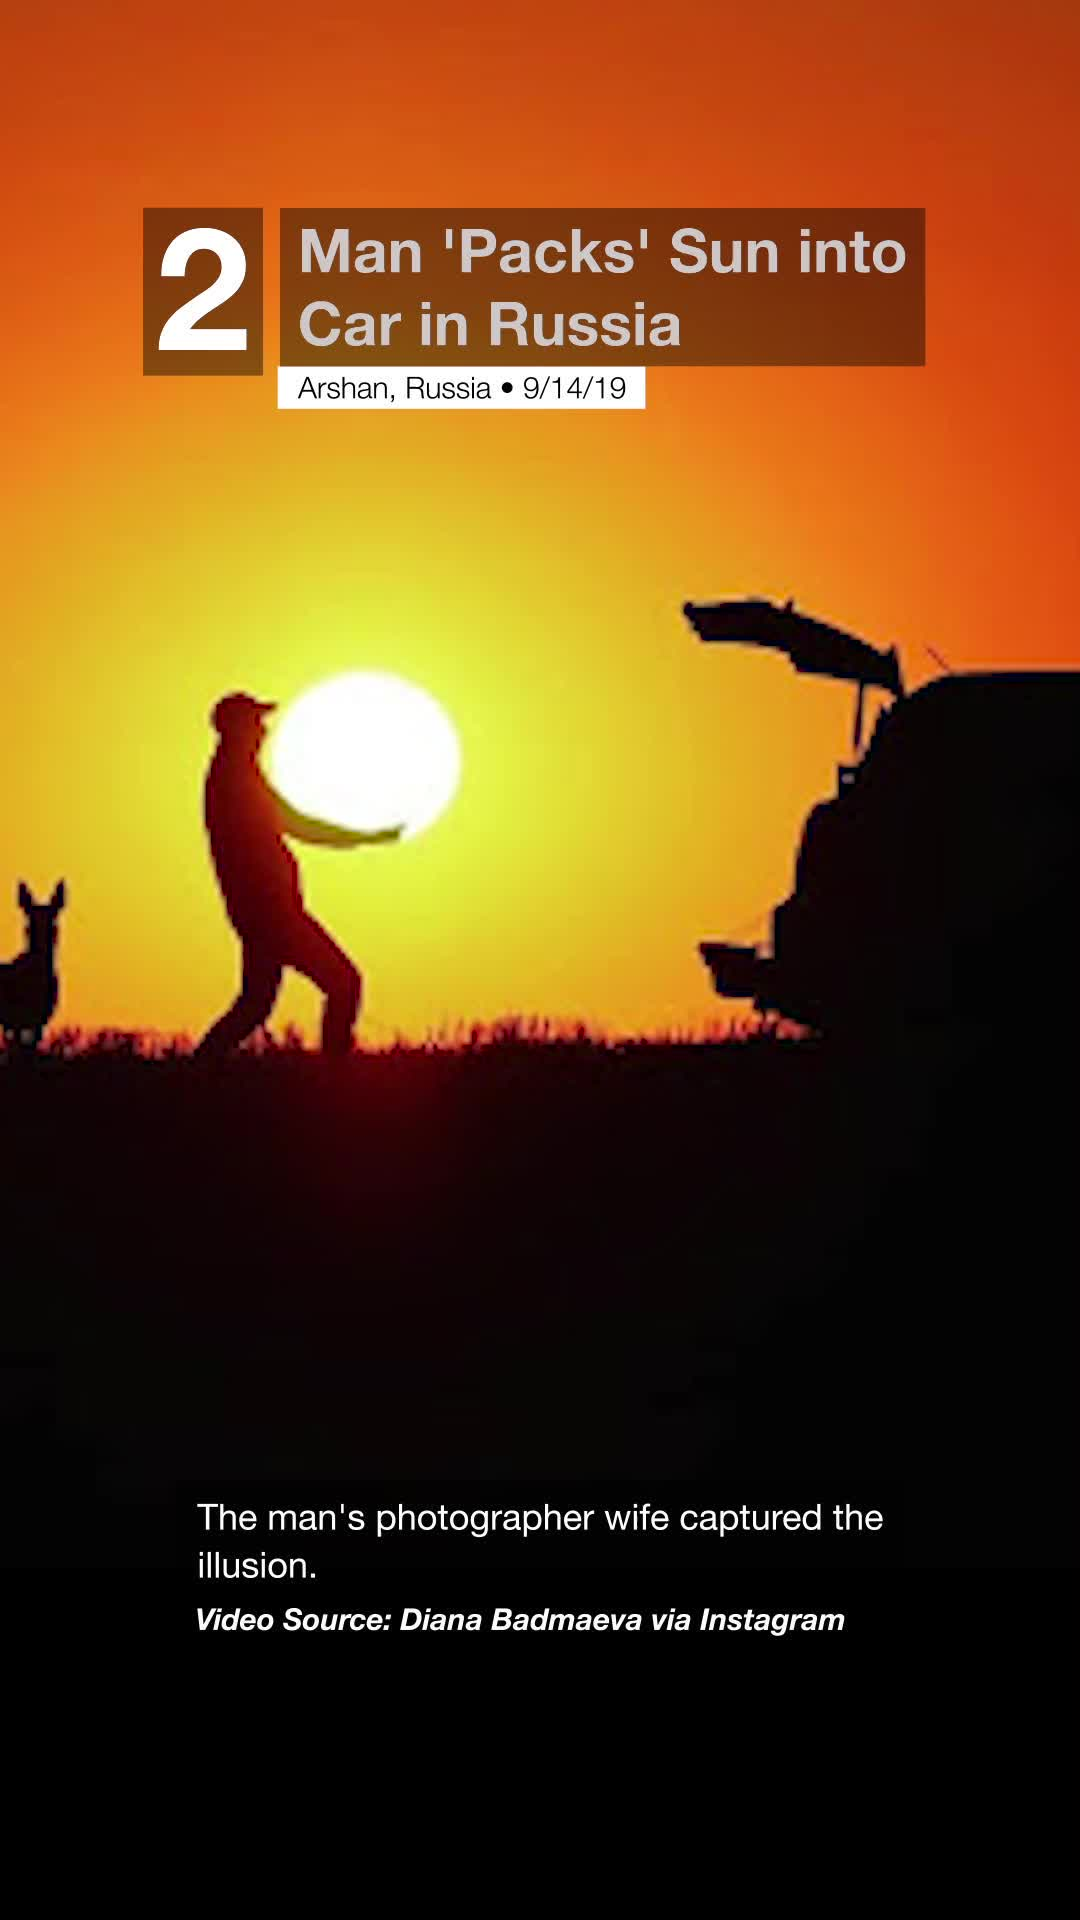 Man 'Packs' Sun into Car in Russia